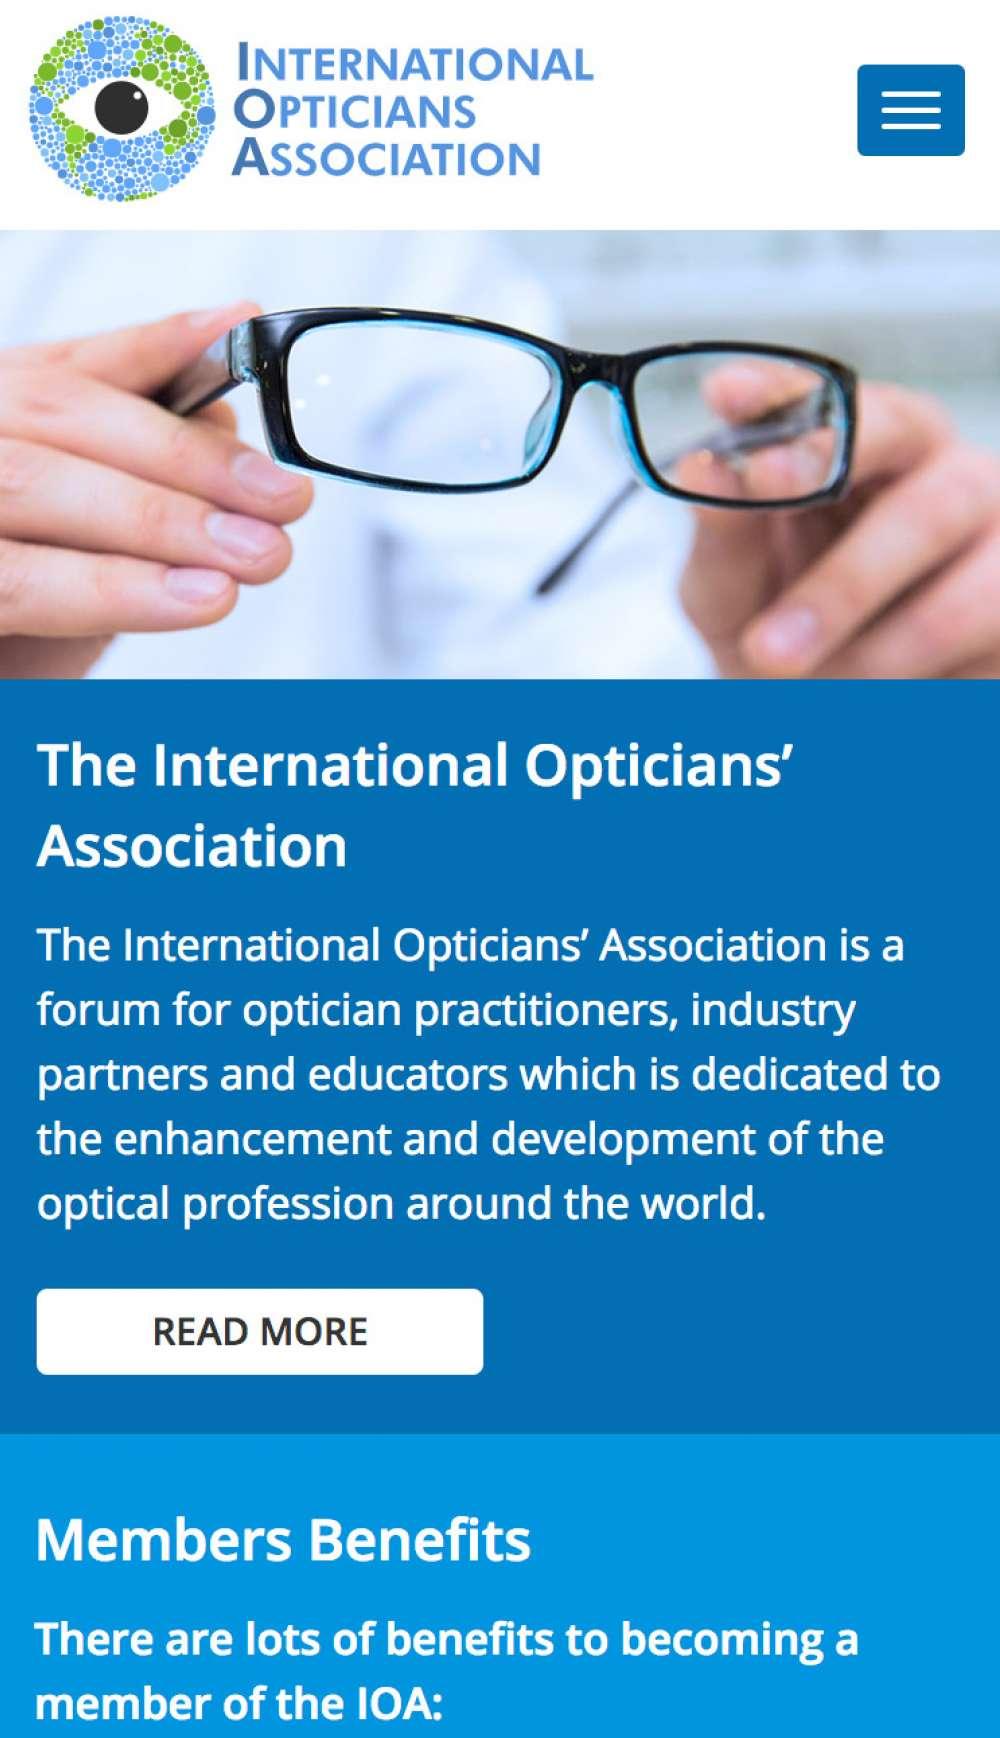 International Optician's Association